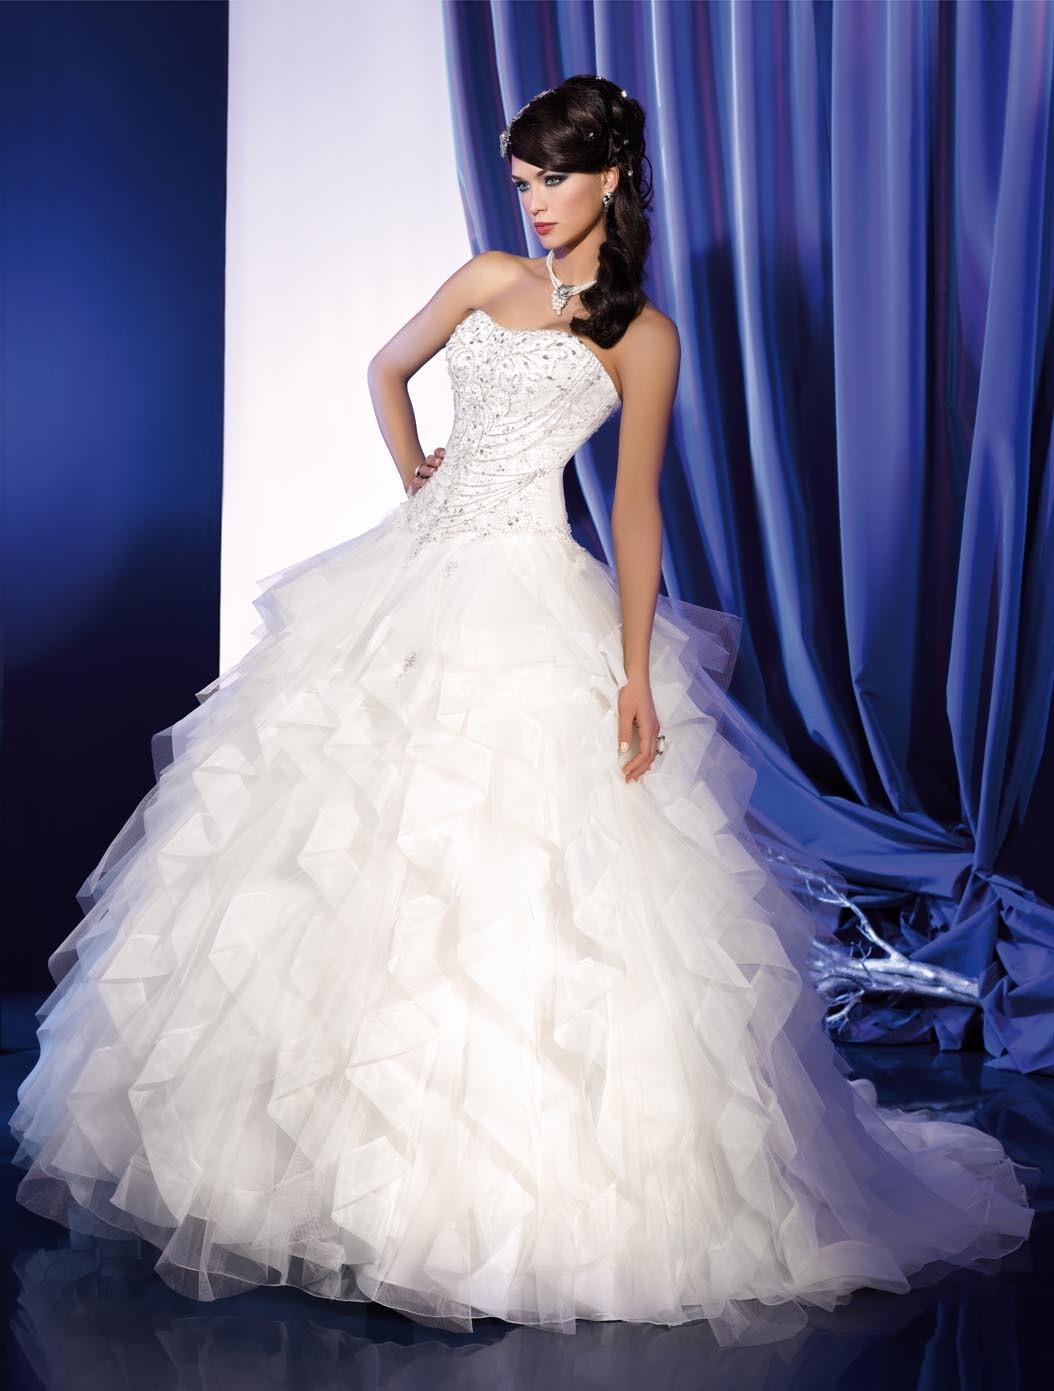 Robes de mari e sur kelly 39 s ks 166 45 46 for Boutiques de robe de mariage kansas city